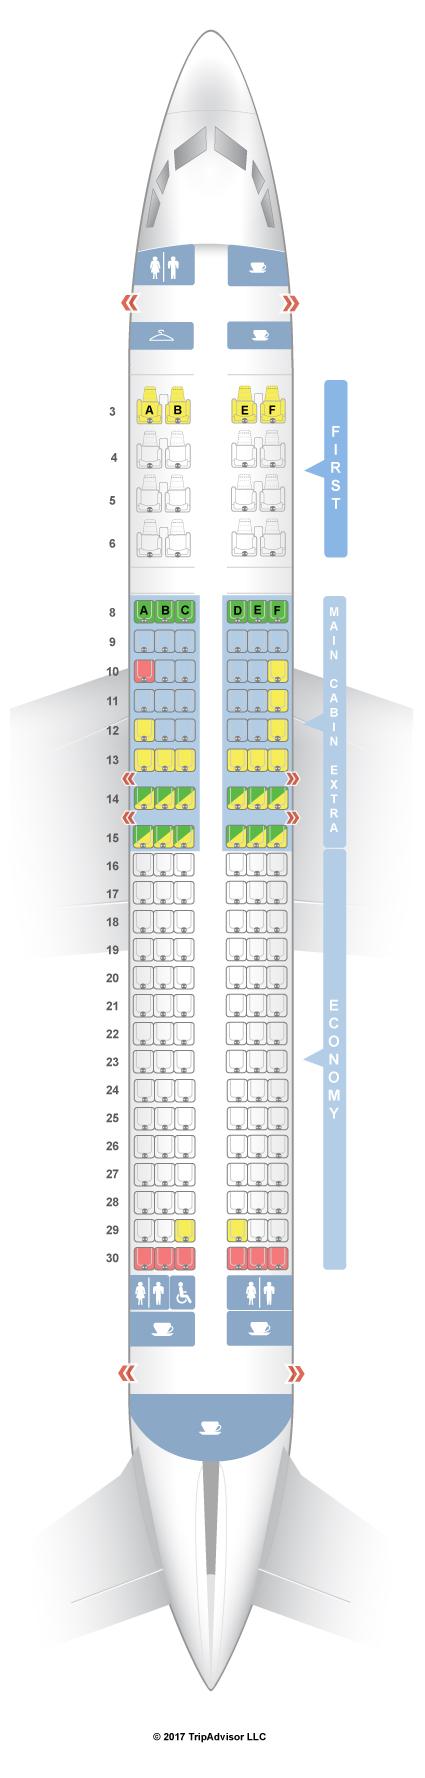 Seatguru Seat Map American Airlines Boeing 737 800 738 V1